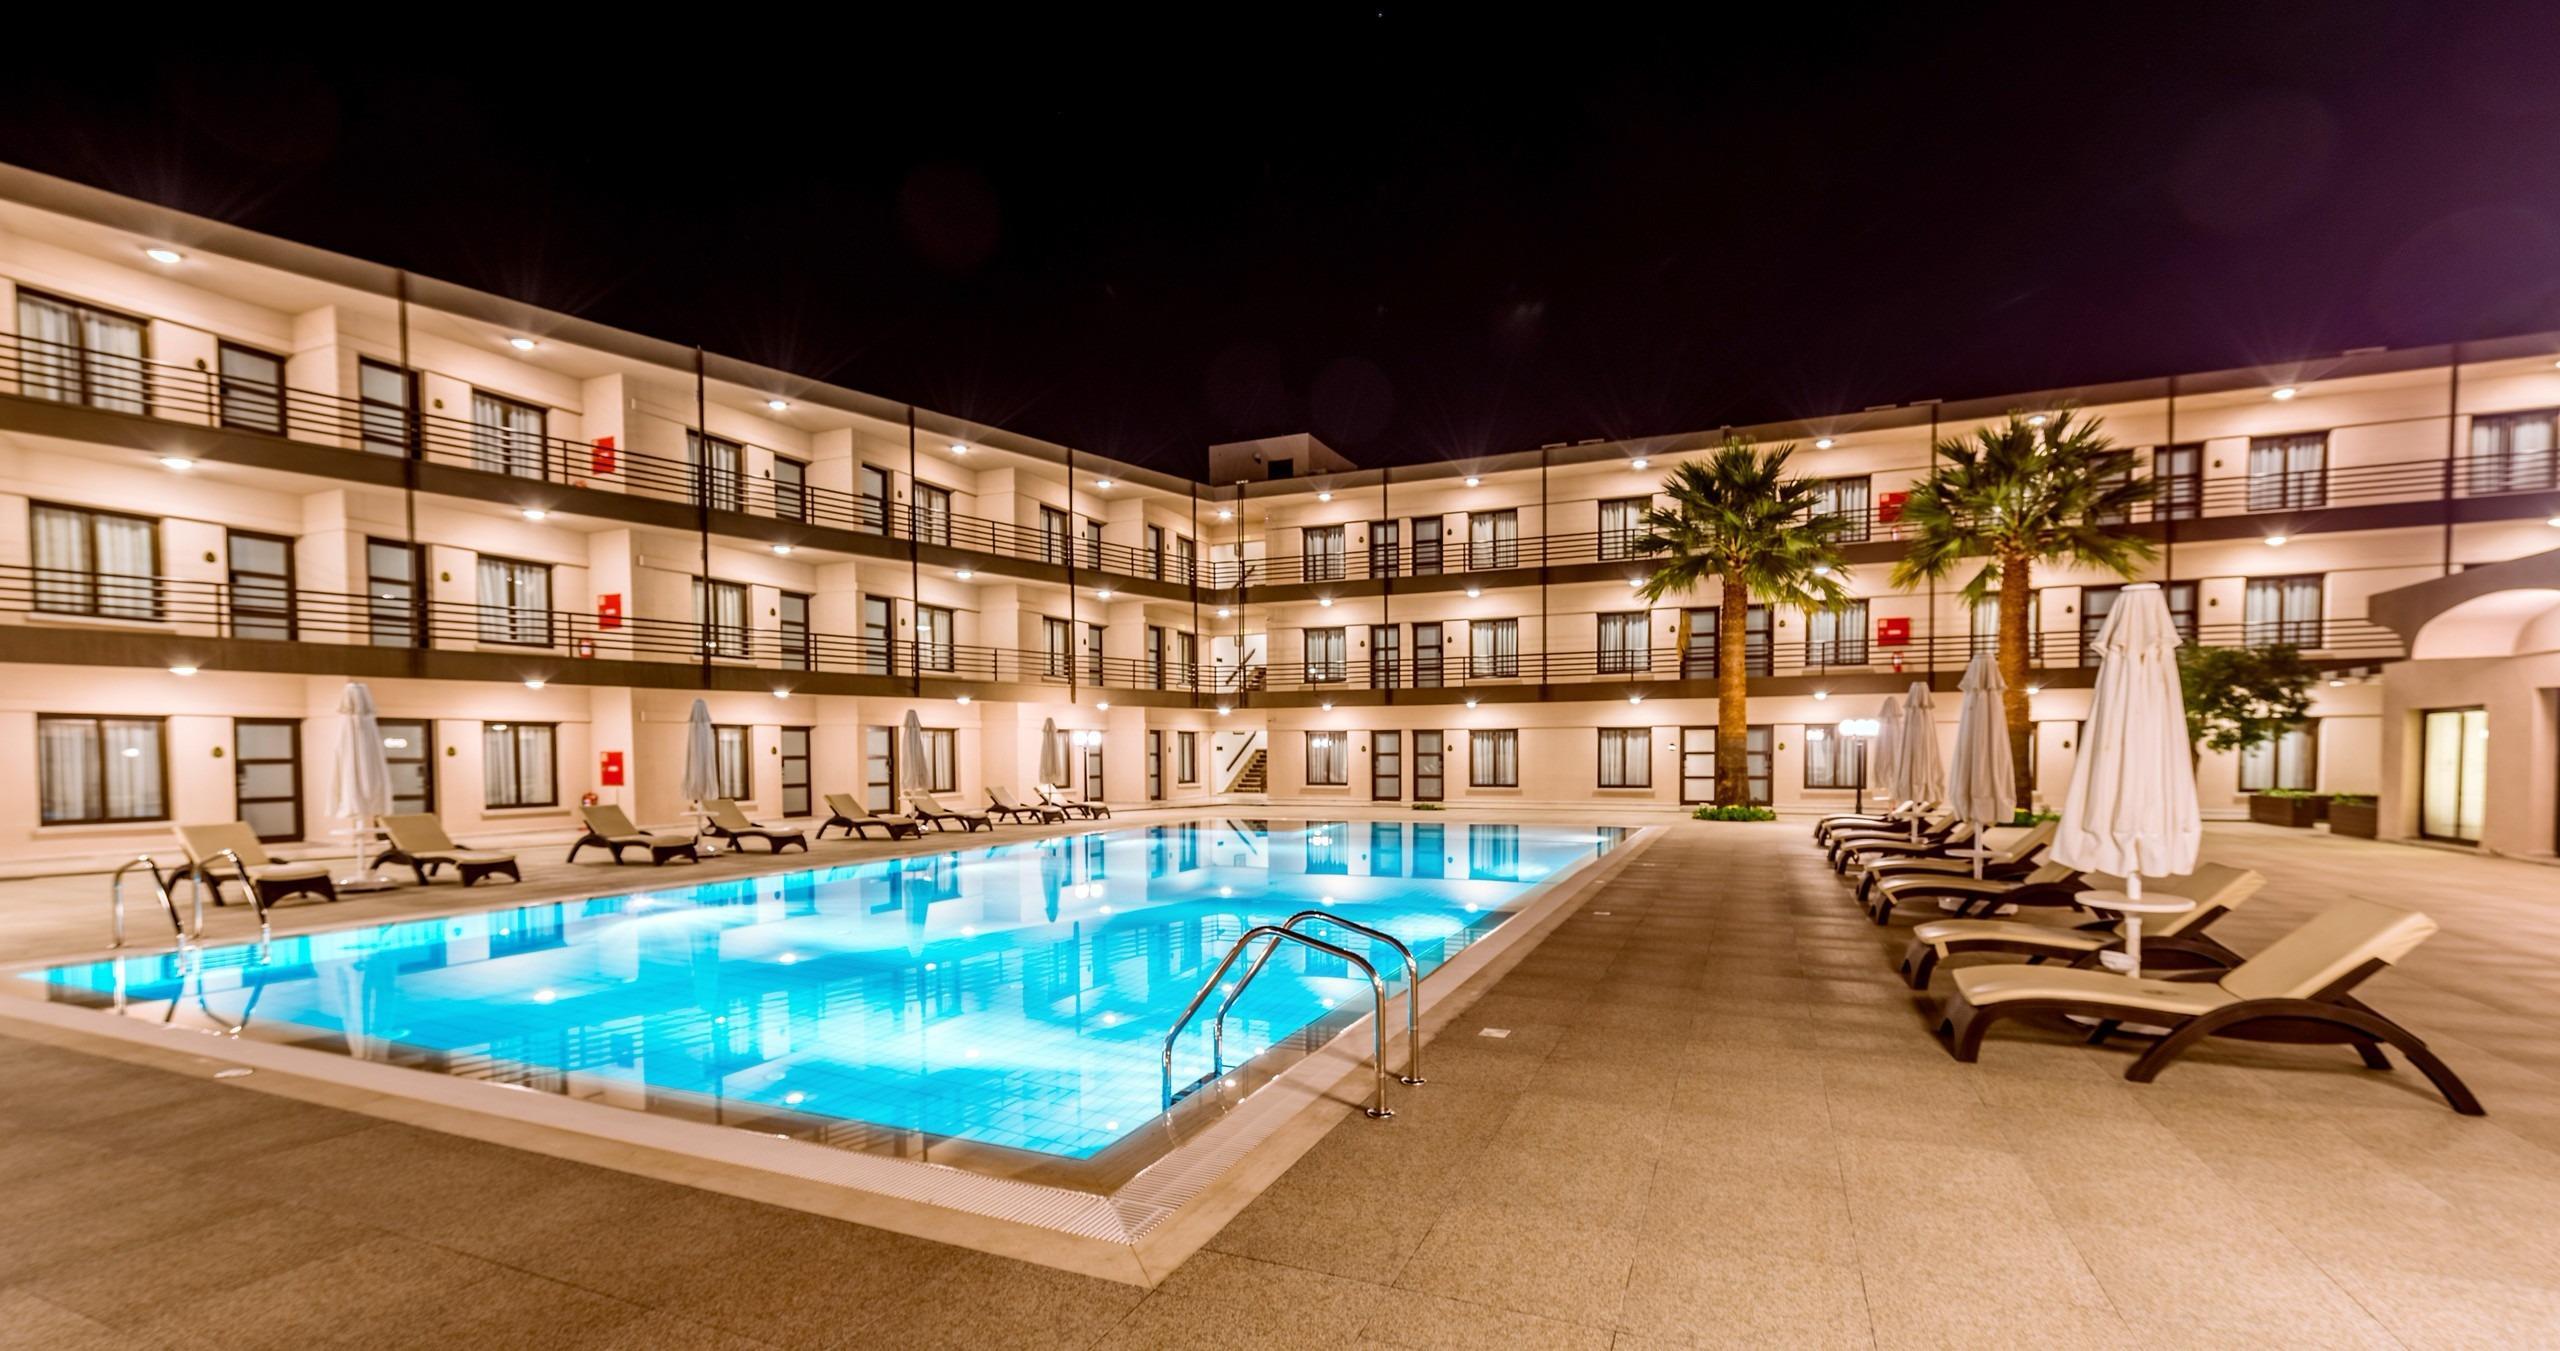 Cipro Nord Hotel Oskar Park 3* Famagusta Tour